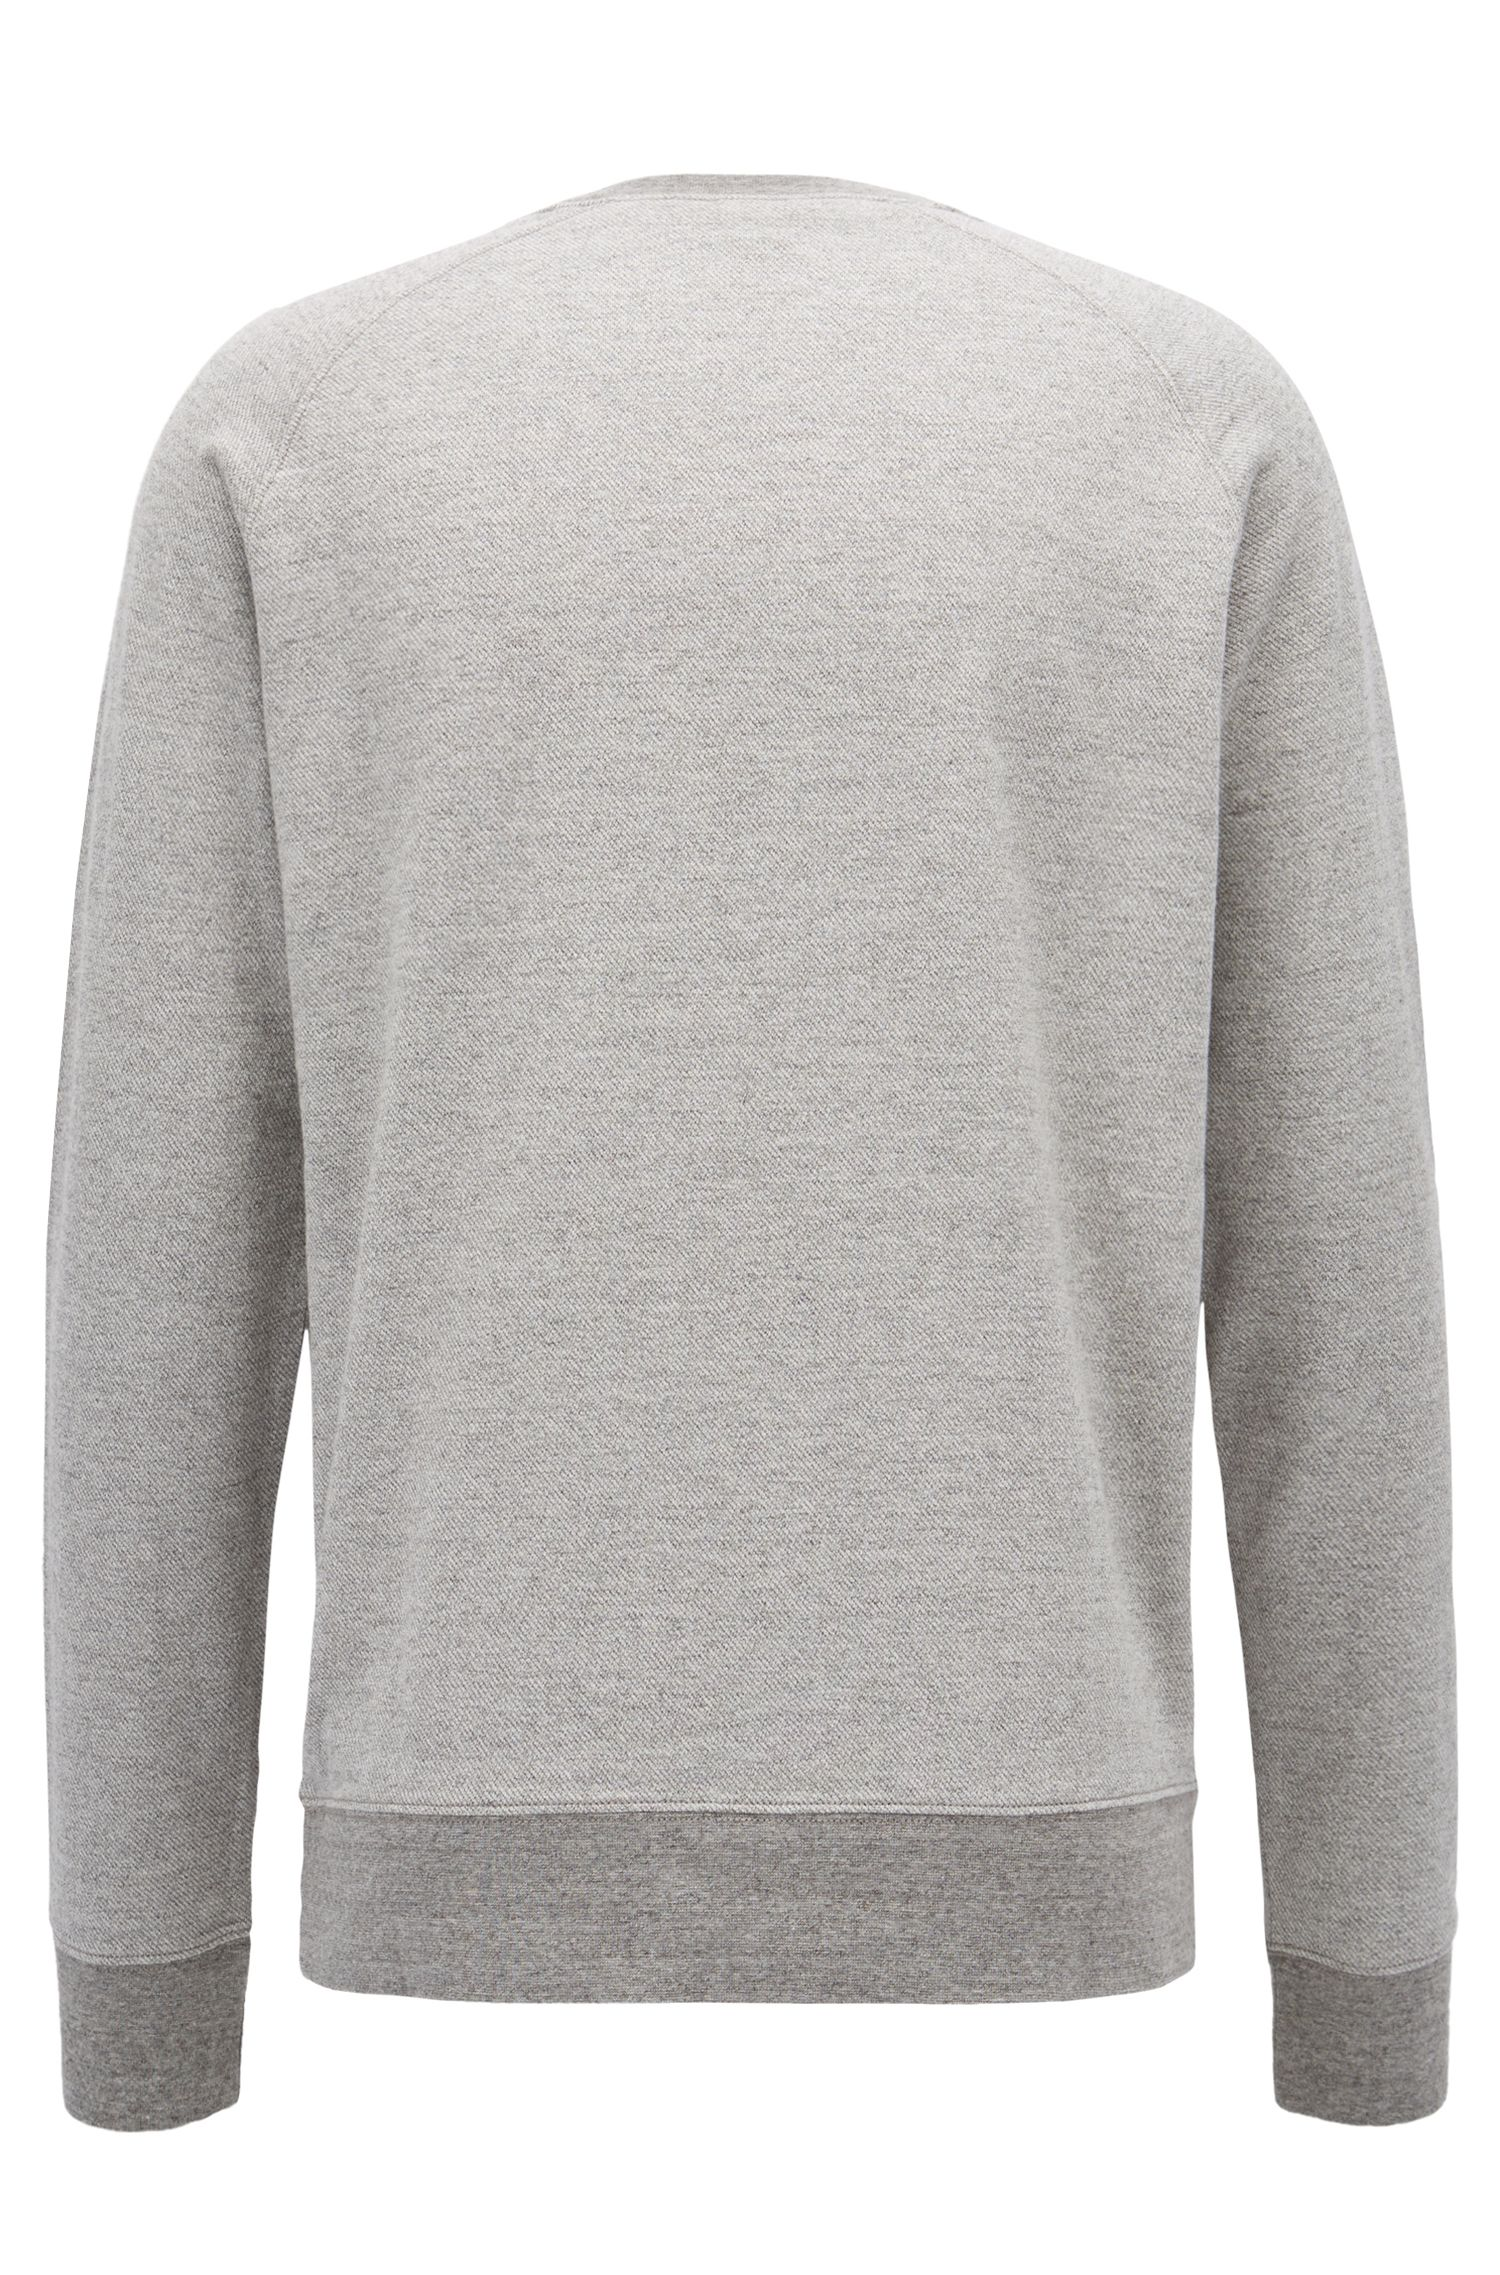 Appliqué Cotton Sweatshirt | Wildlife